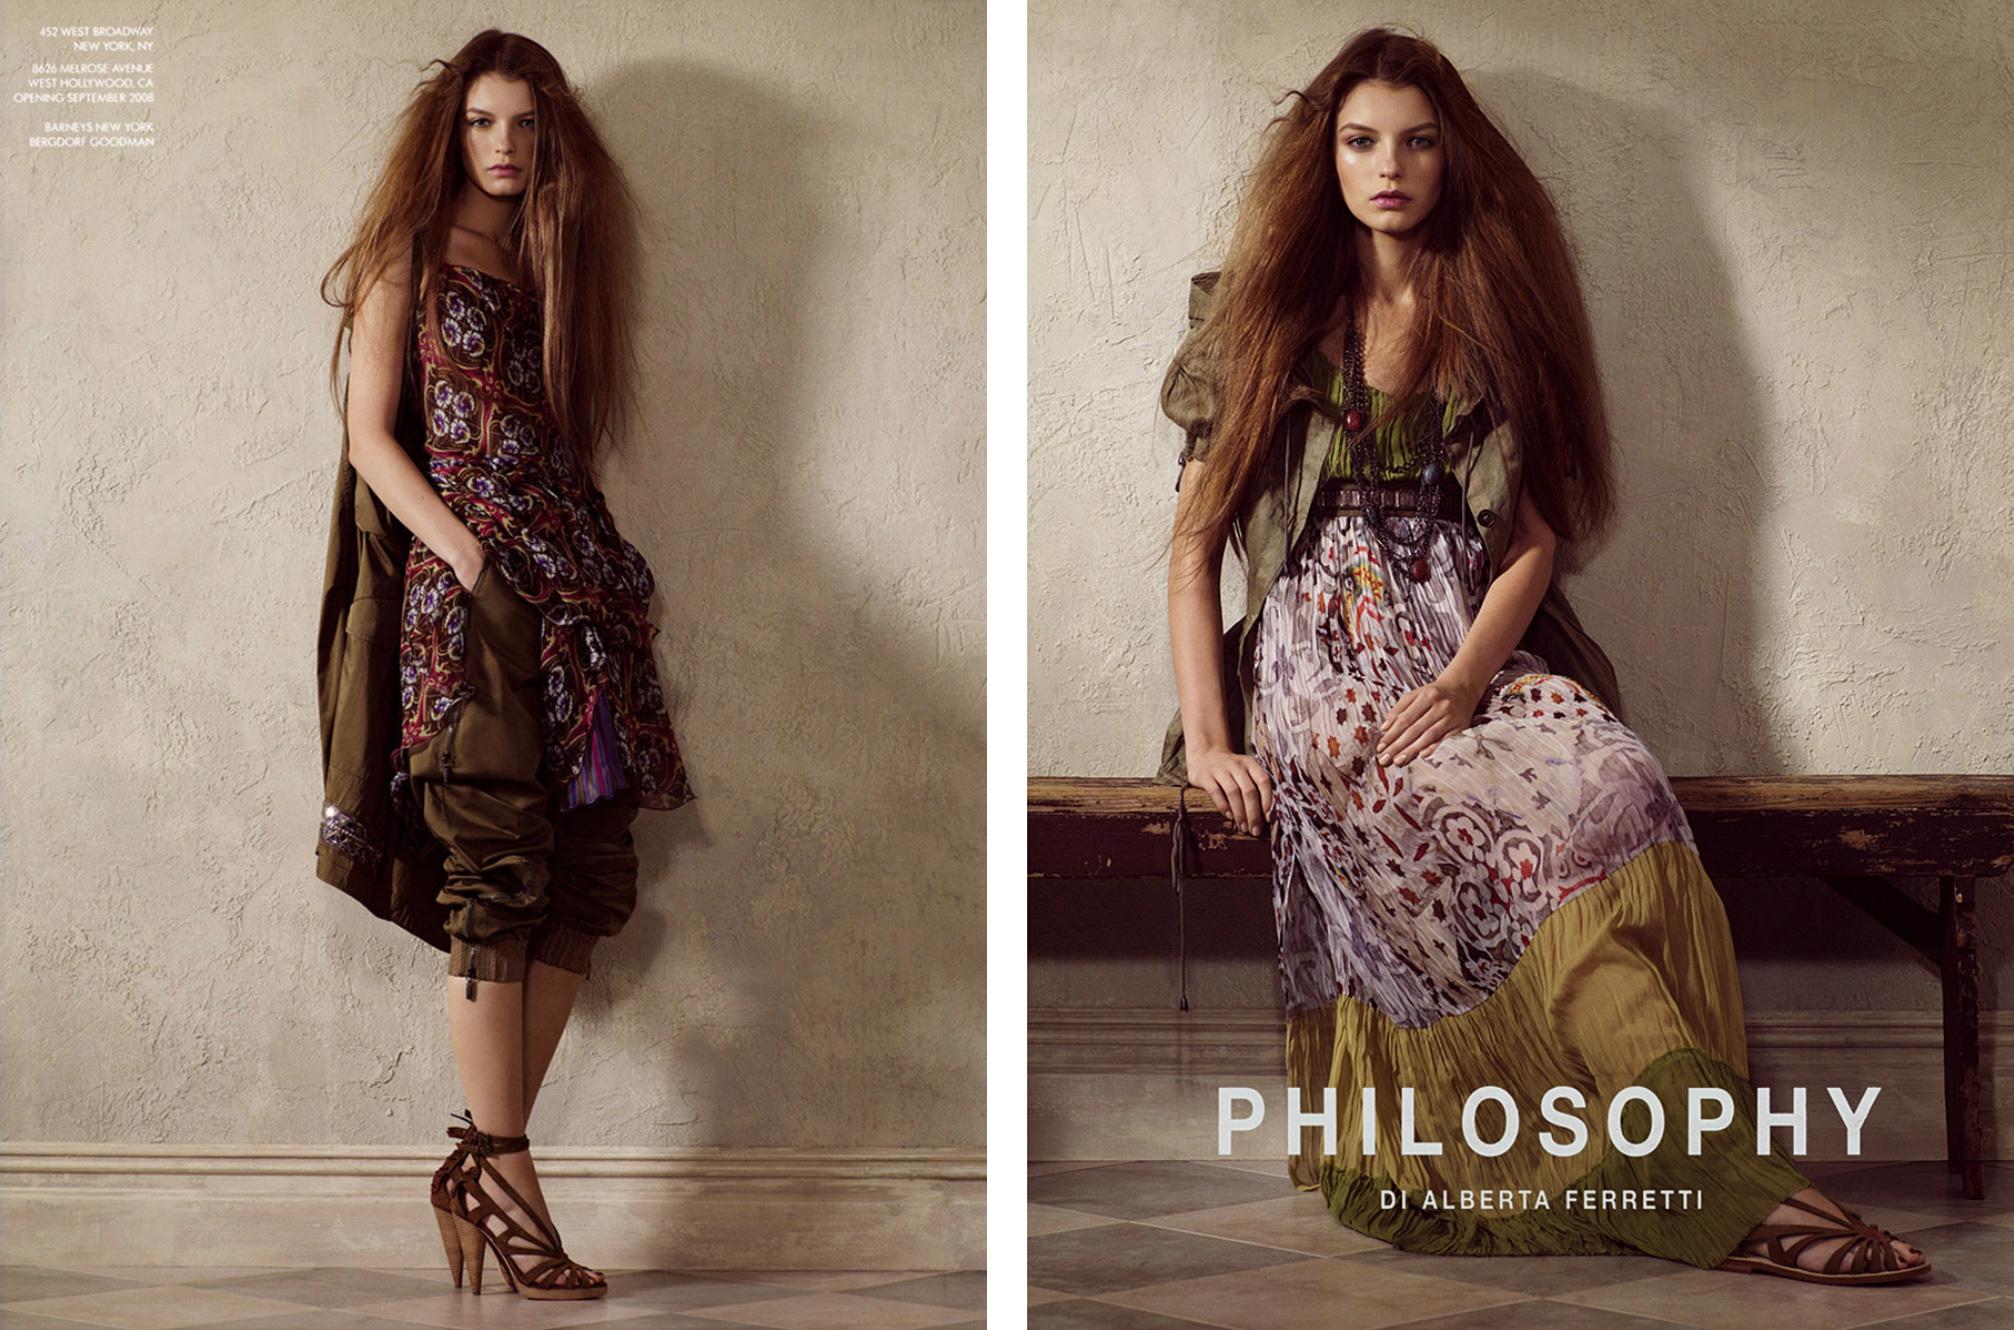 Philosophy-2.jpg